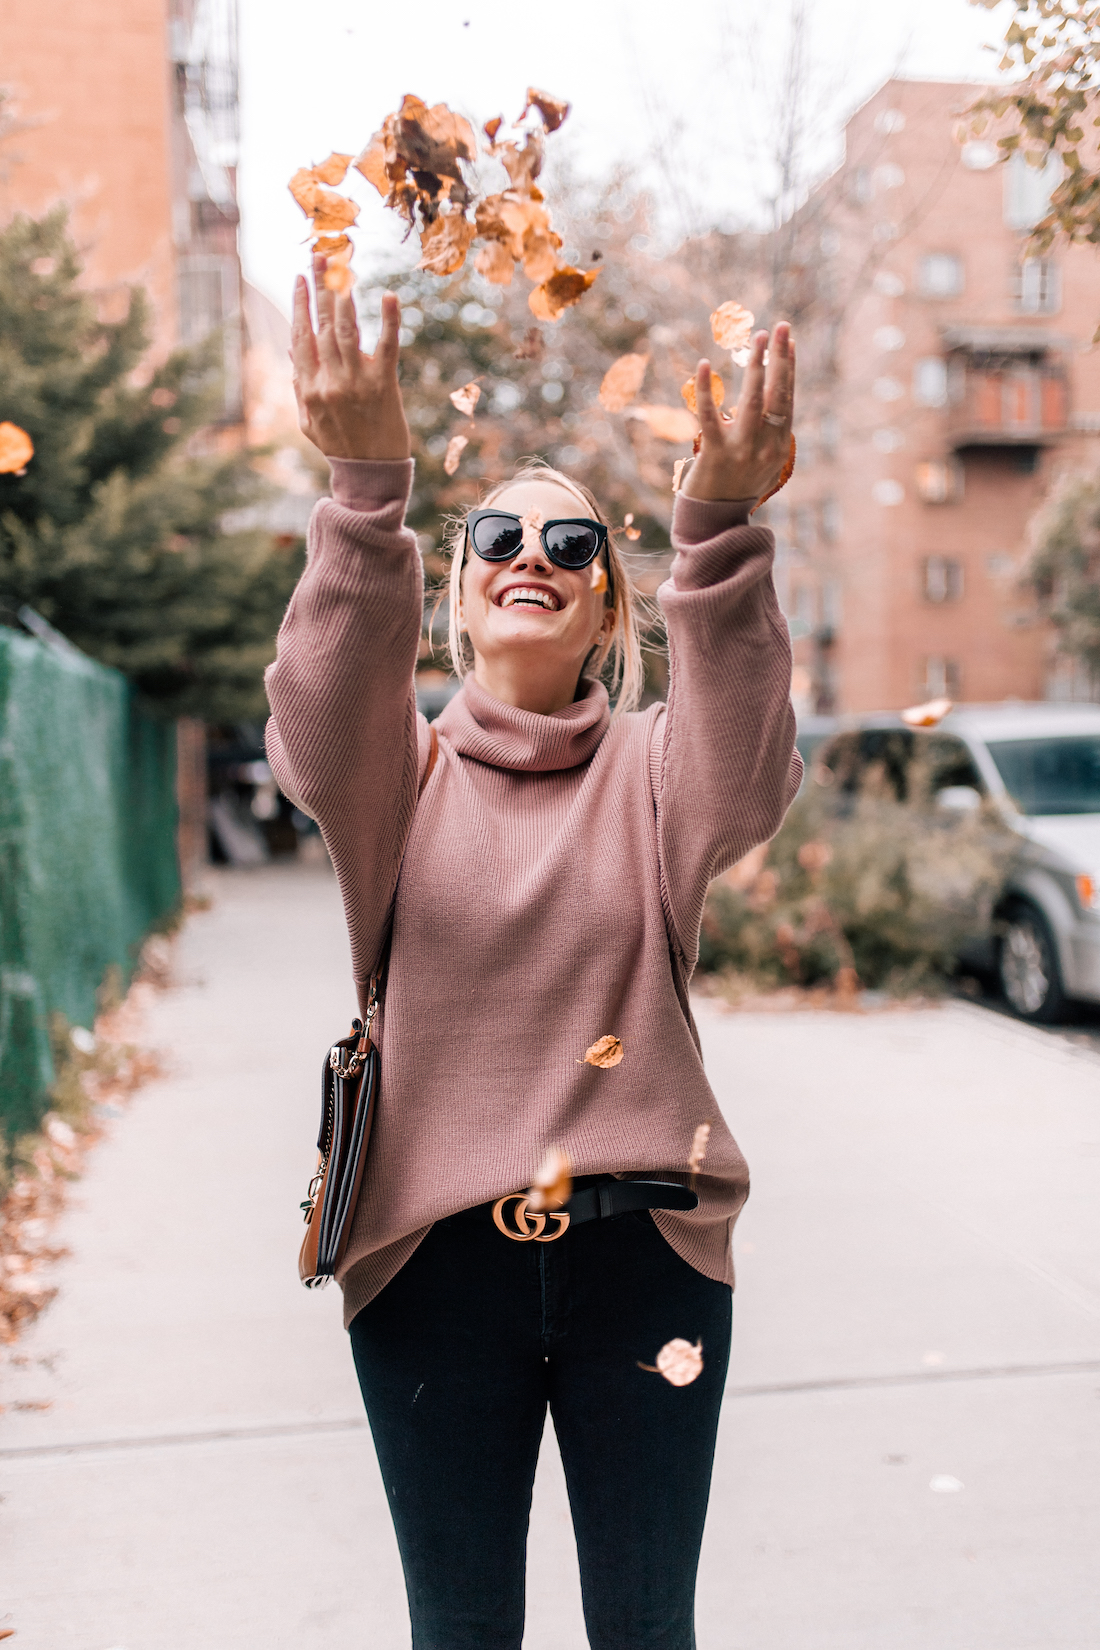 Free People Softly Structured Tunic Sweater //American Eagle Jeans // Gucci Belt // Chloe Faye Bag //Karen Walker Sunglasses //Charlotte Tilbury Lipstick